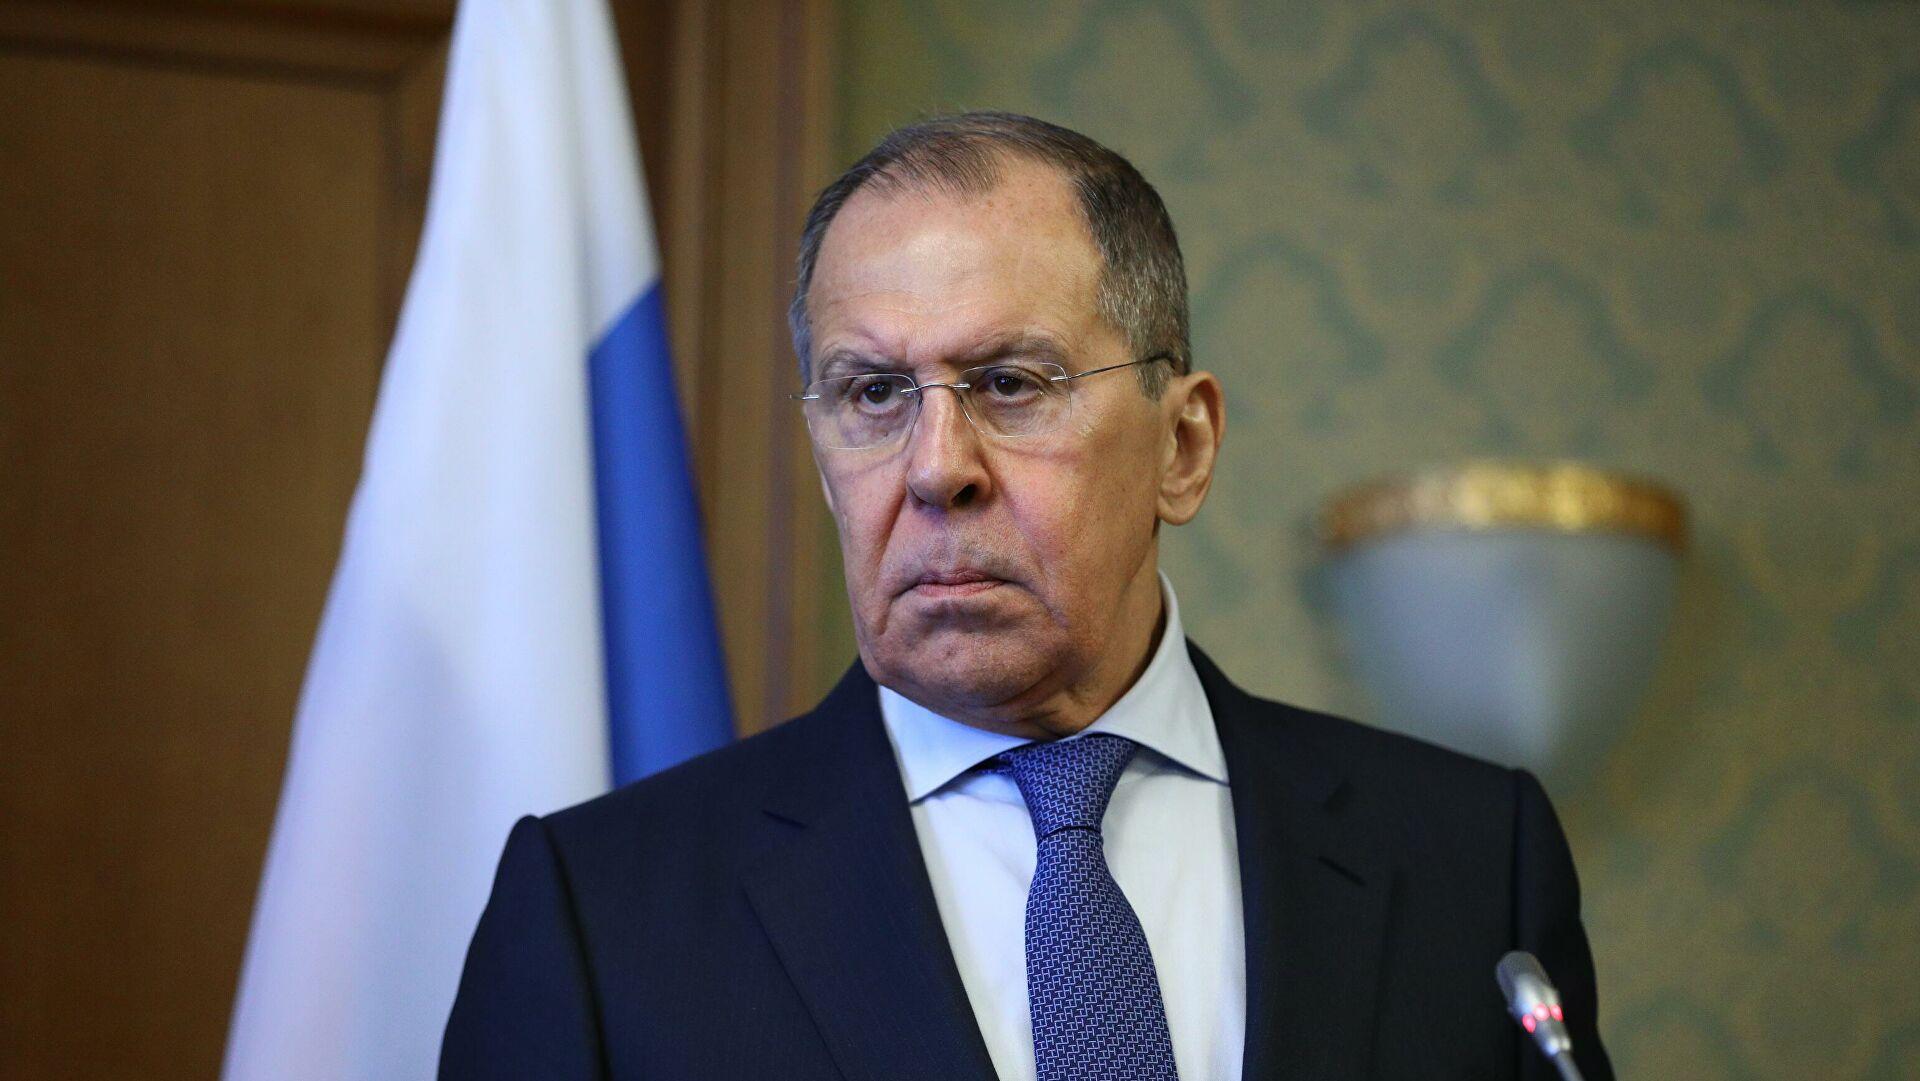 Lavrov: Moskva spremna da obnovi normalne odnose sa Kijevom